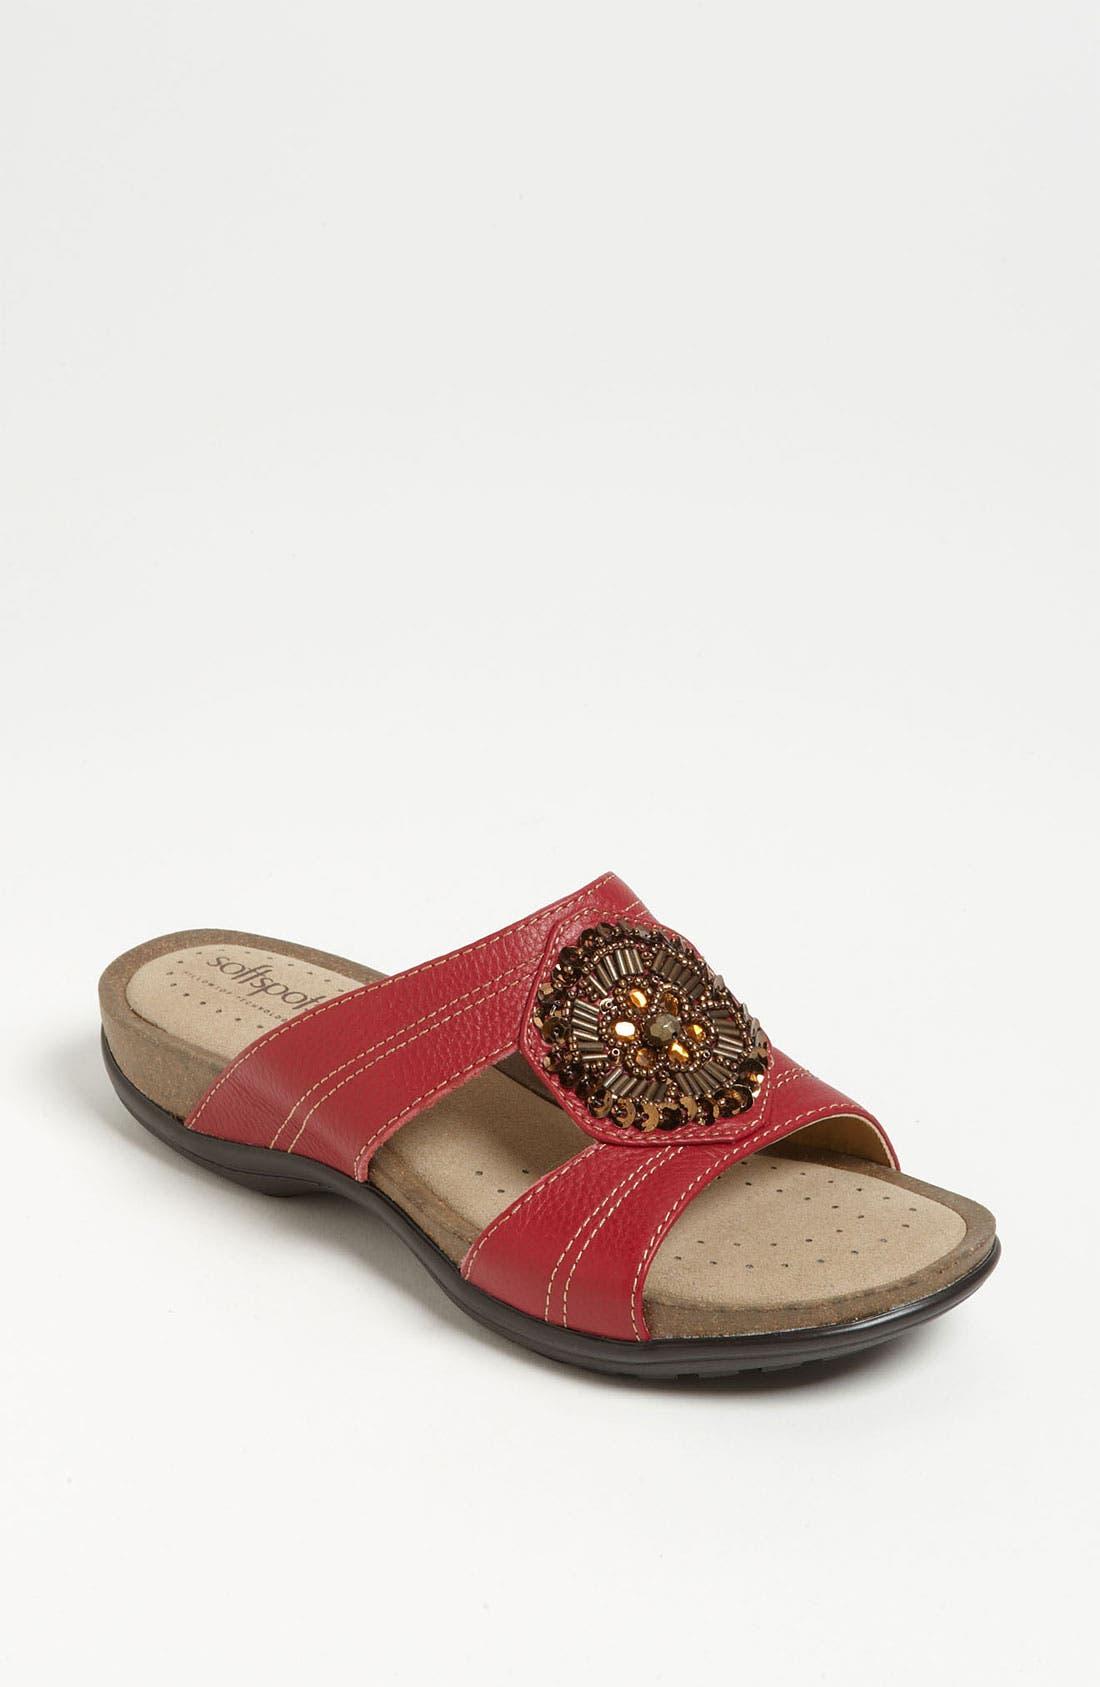 Alternate Image 1 Selected - Softspots Beaded Sandal